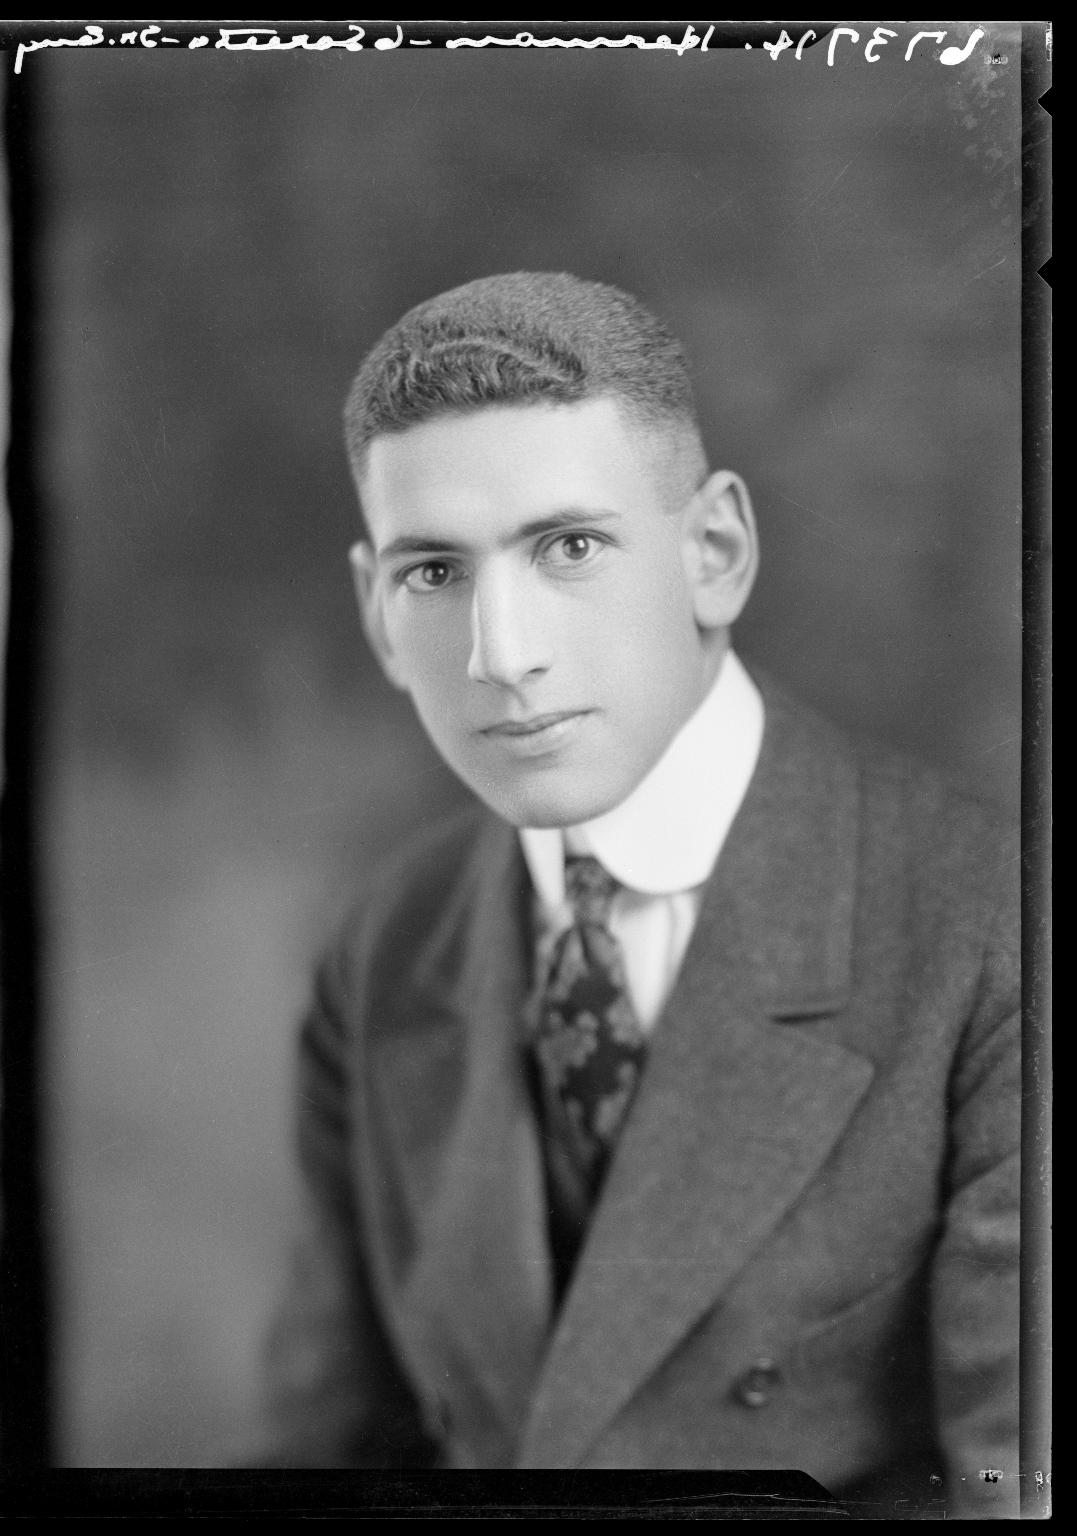 Portrait of Harry Herman